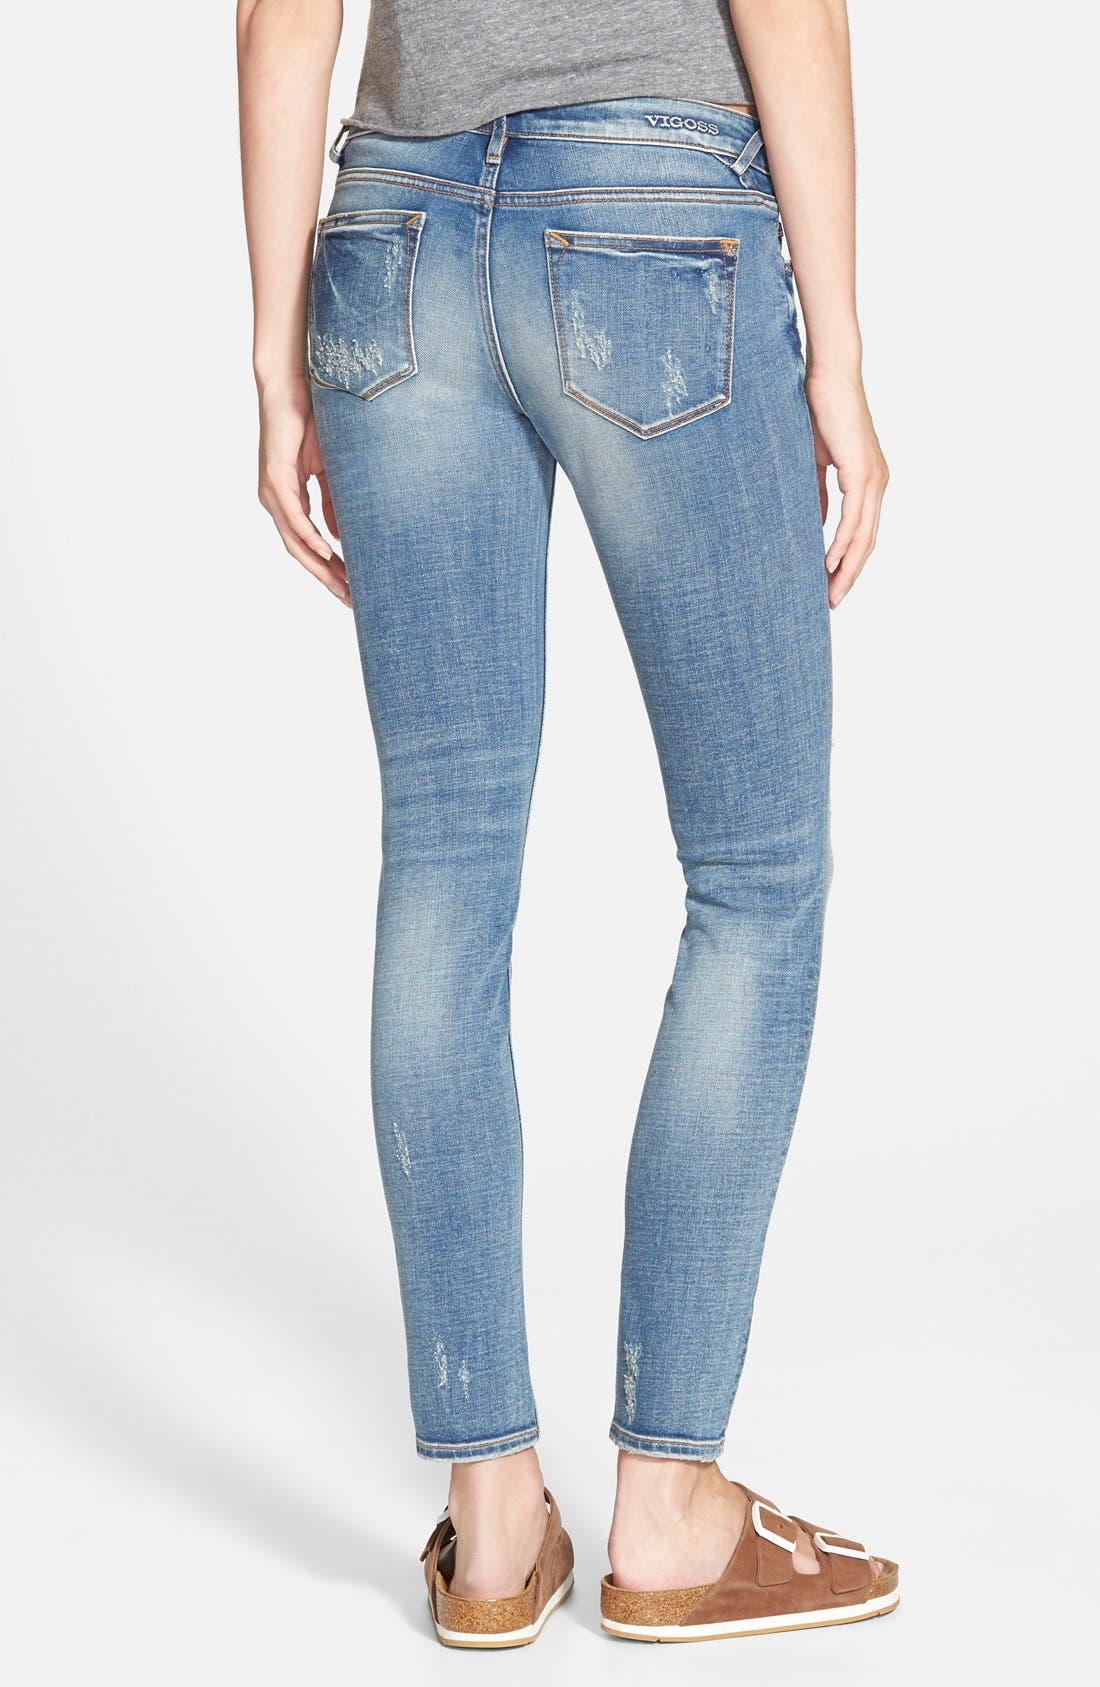 Alternate Image 2  - Vigoss Distressed Skinny Jeans (Light Wash)